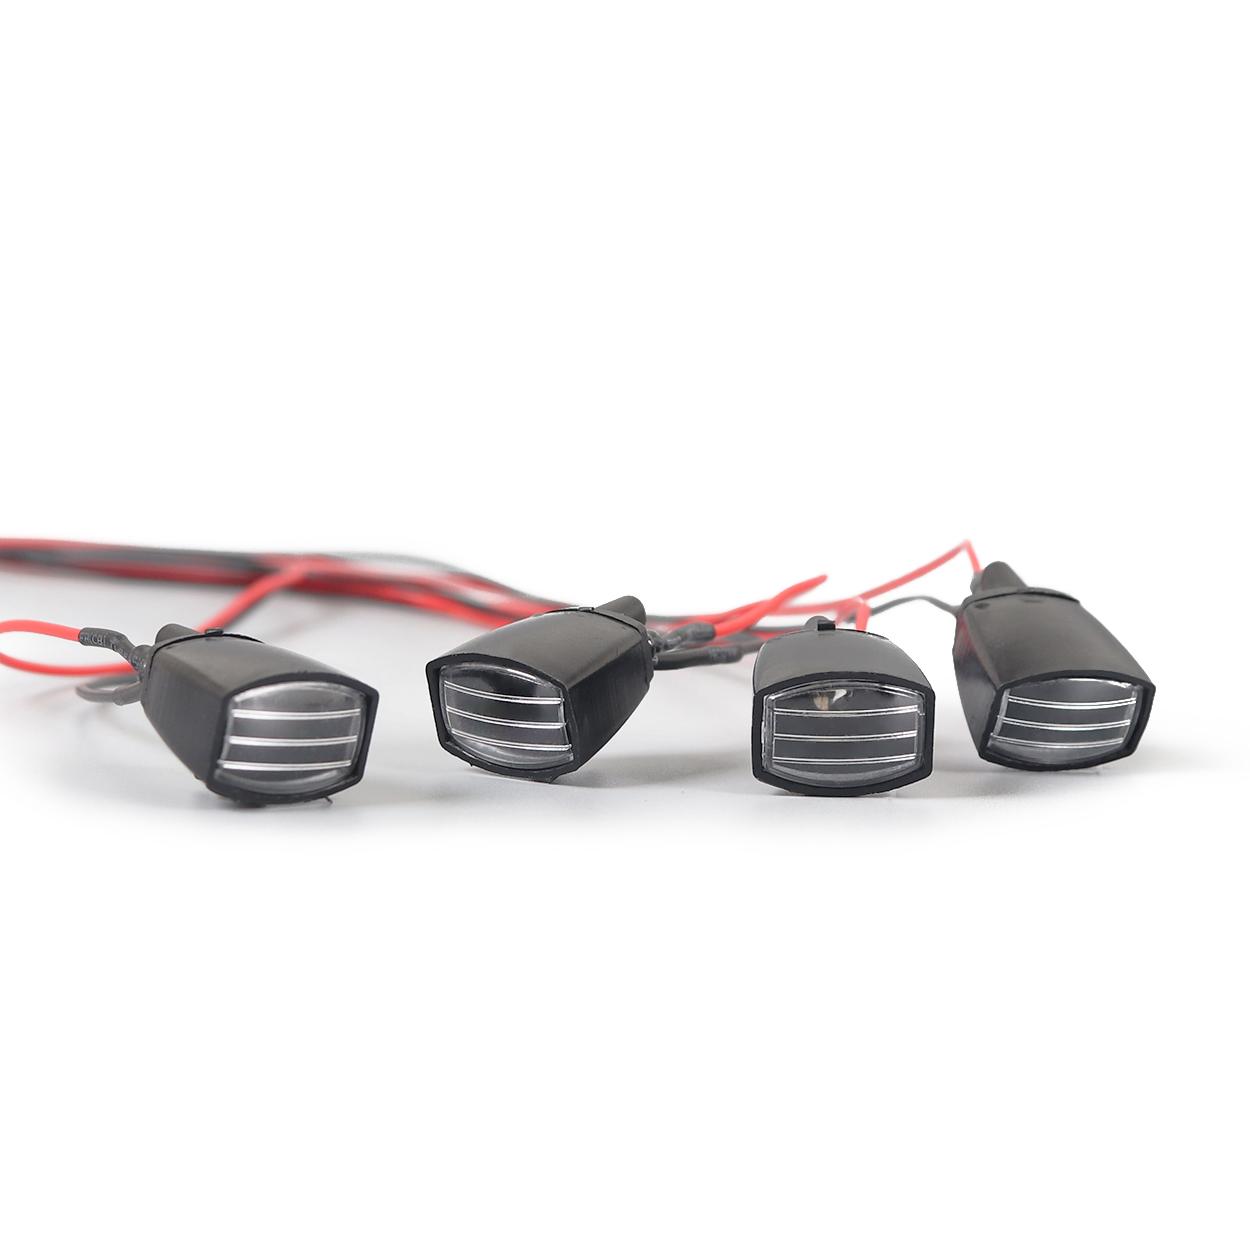 RC Roof Luggage LED Light Bar Kit Lamp for 1/10 Crawler Car Traxxas Trx-4 TRX4 Axial SCX10 RC4WD D90 HSP RGT black